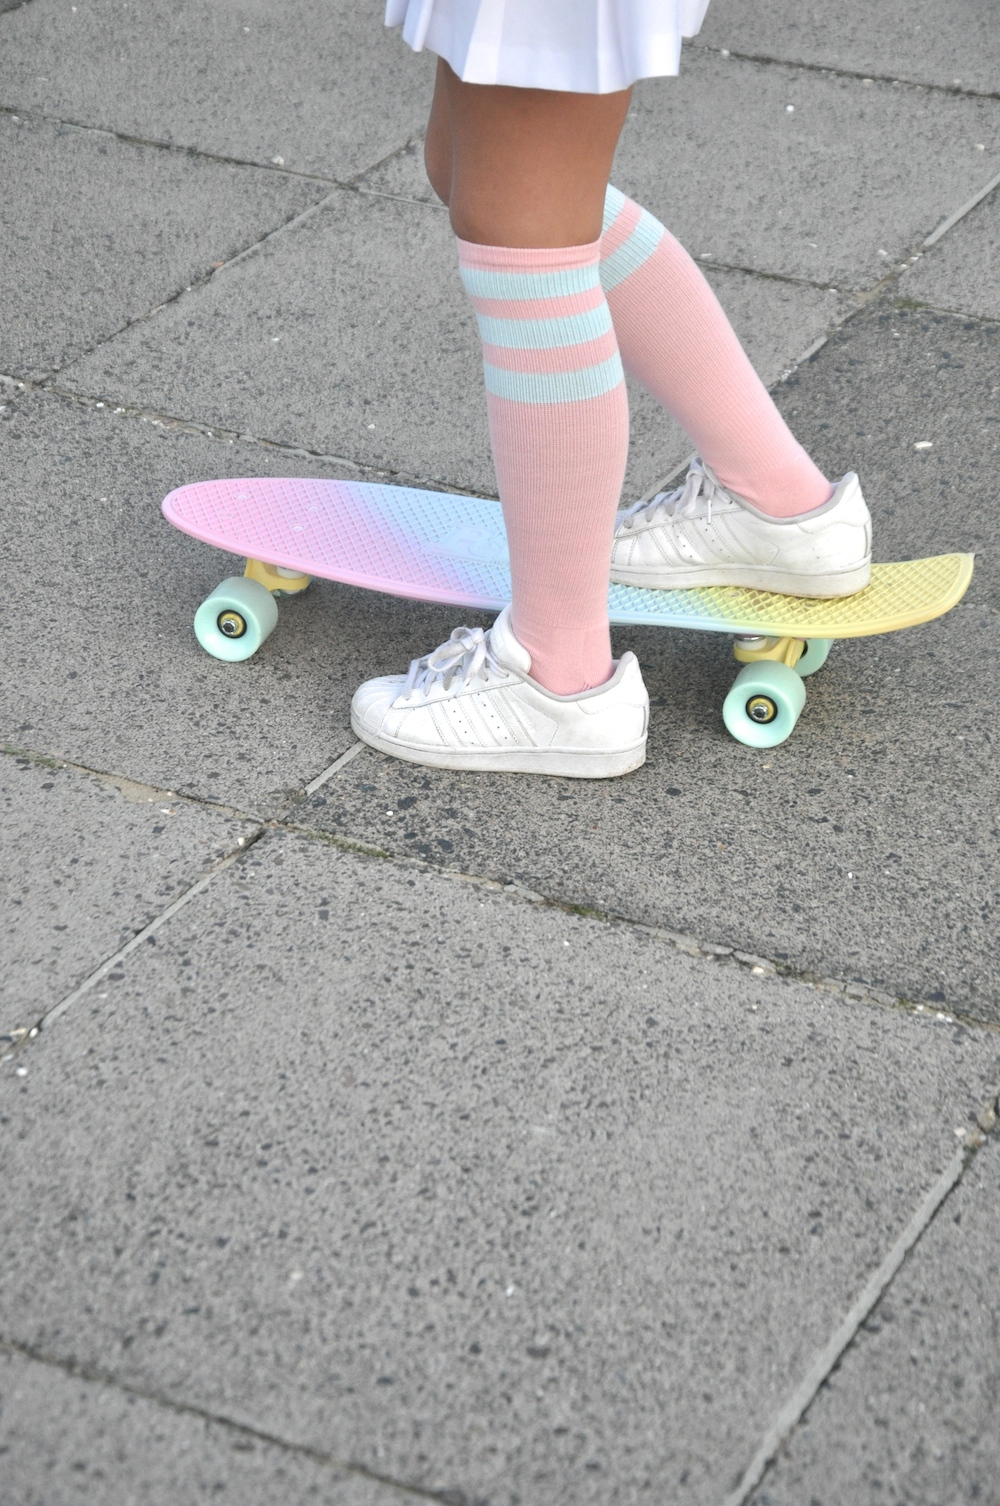 Pastel_fade_American_apparel_penny_skateboards